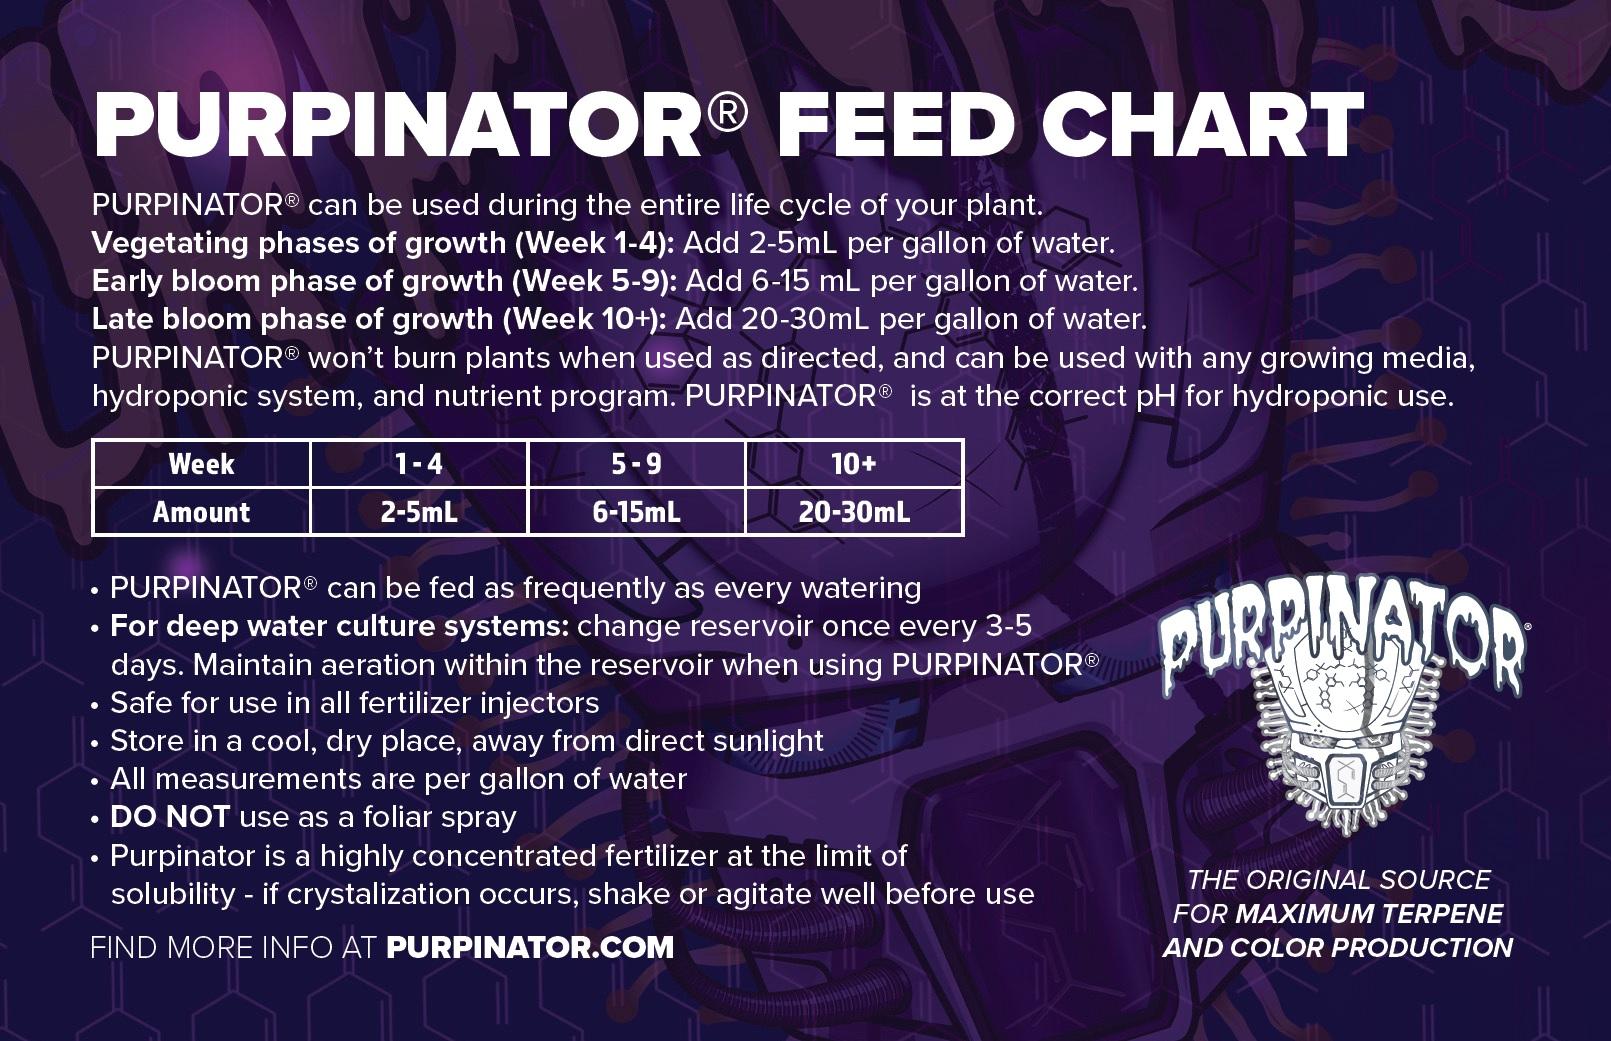 my420gadgets - Purpinator - Botanical Plant Oil